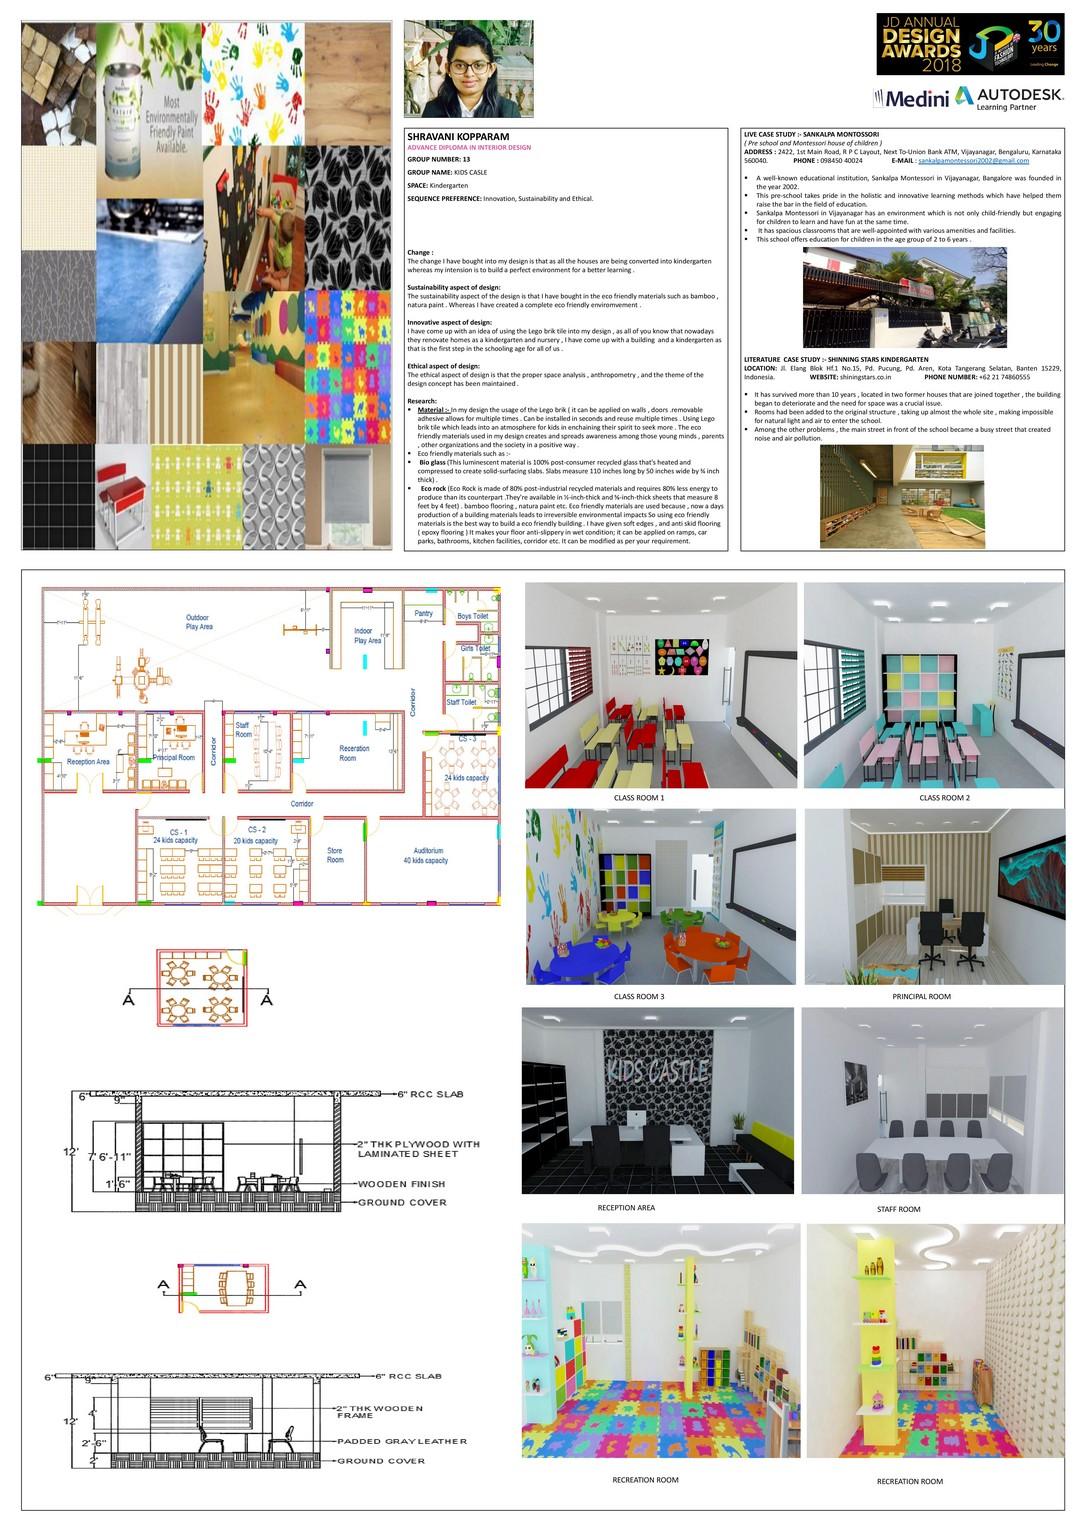 Kindergarten – Change – JD Annual Design Awards 2018 | Designer: Shravani KV | Photography : Jerin Nath (@jerin_nath) kindergarten - kinder garten1 - Kindergarten – Change – JD Annual Design Awards 2018